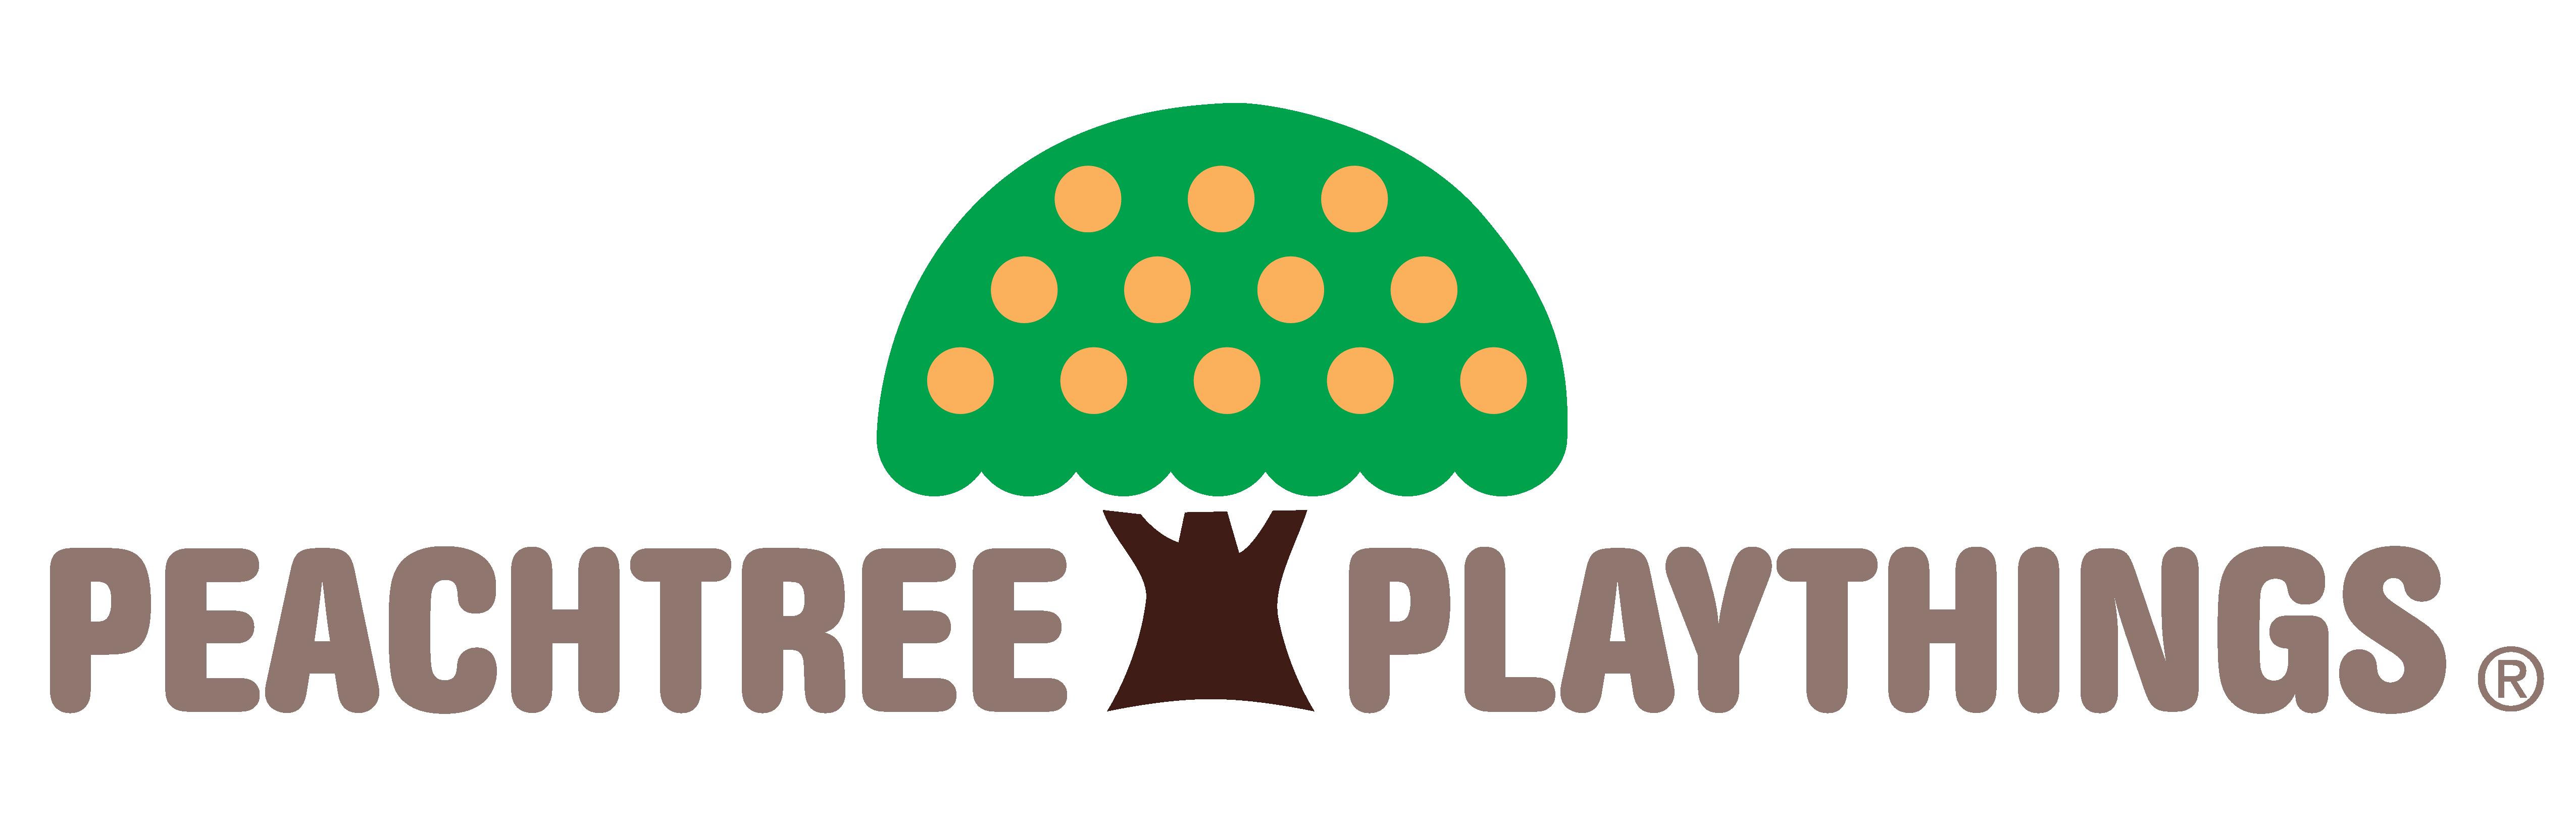 Peachtree Playthings logo